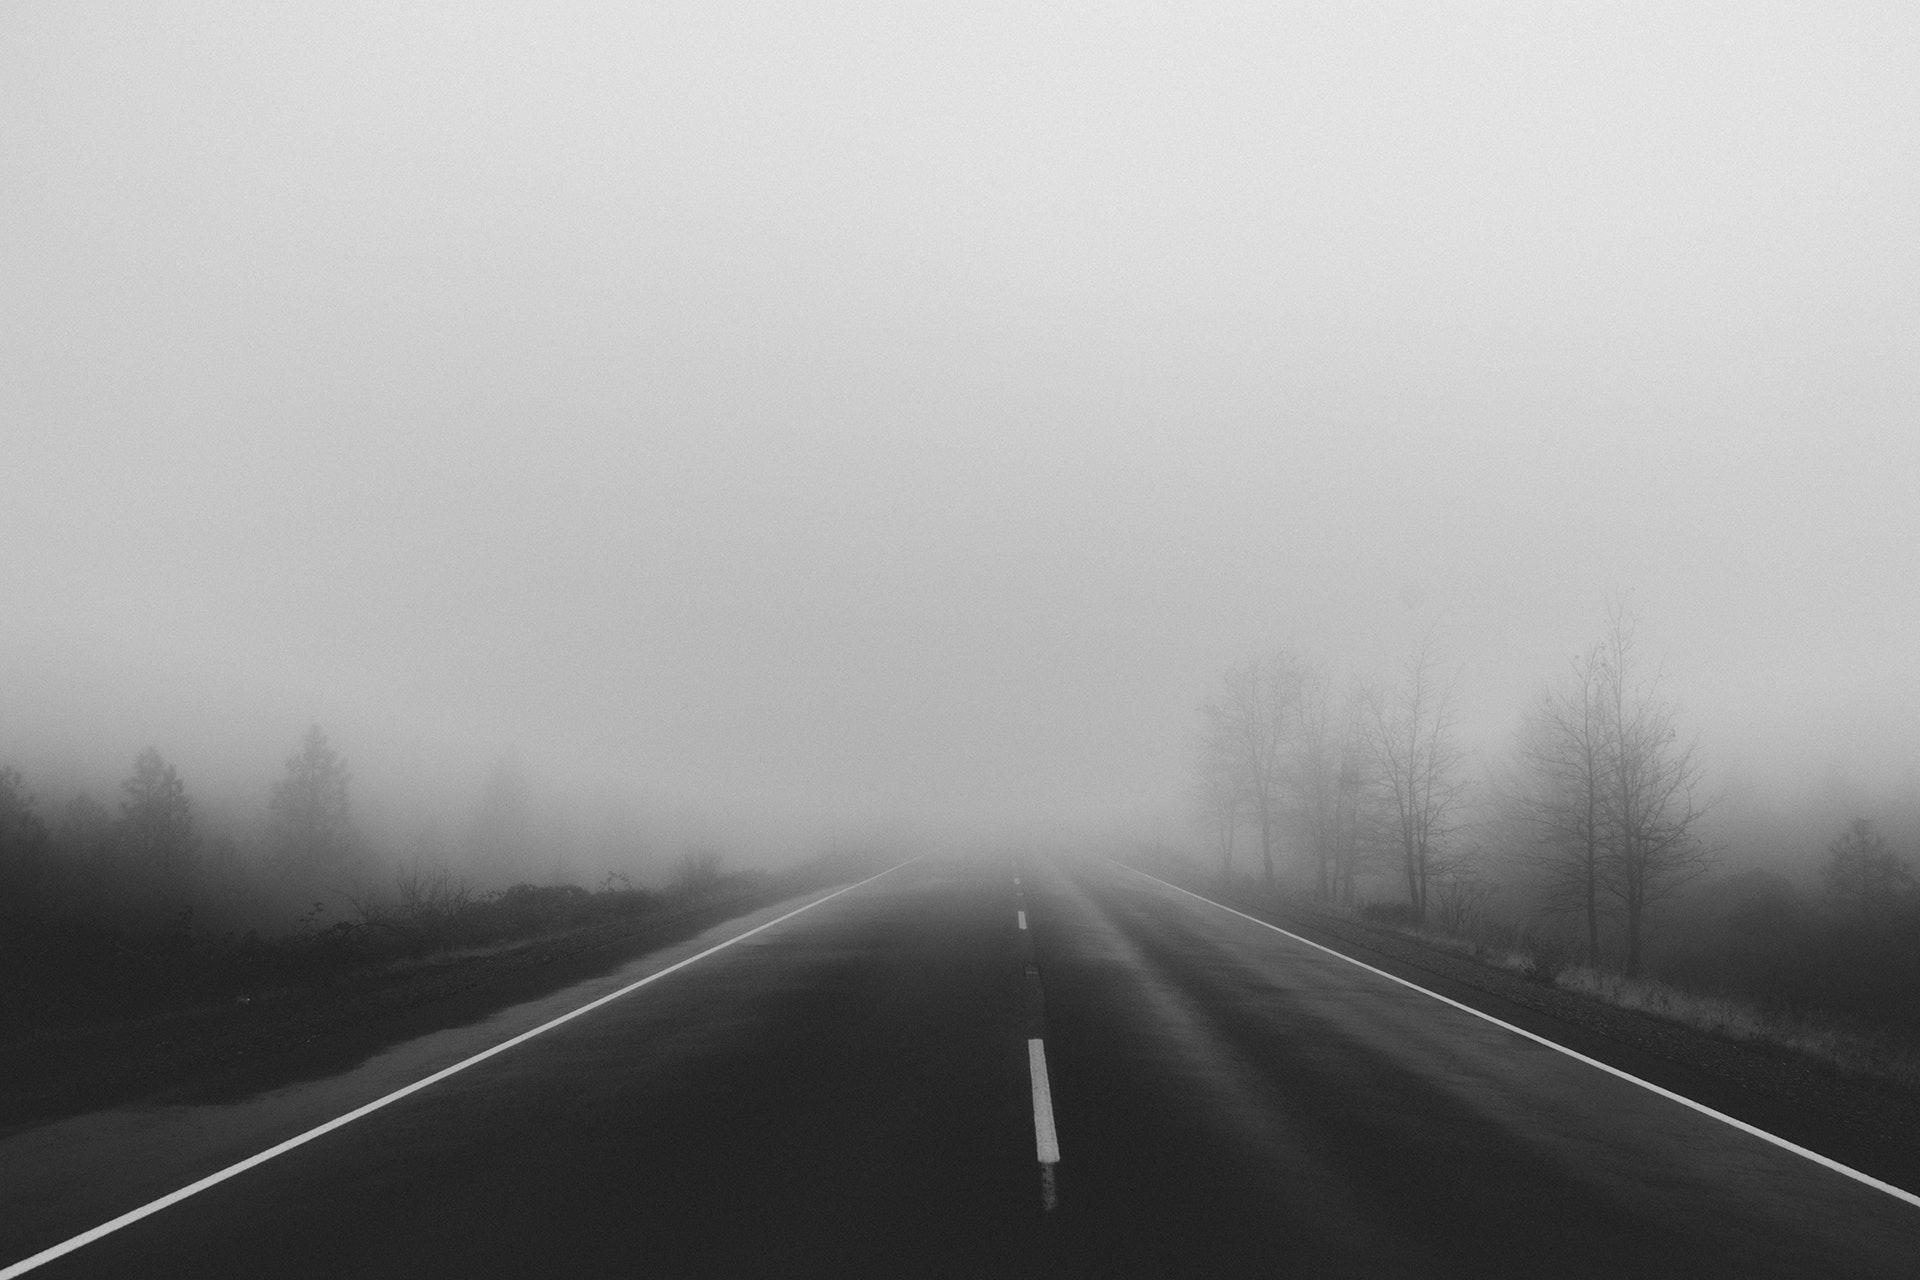 uncertainty_fog_mist